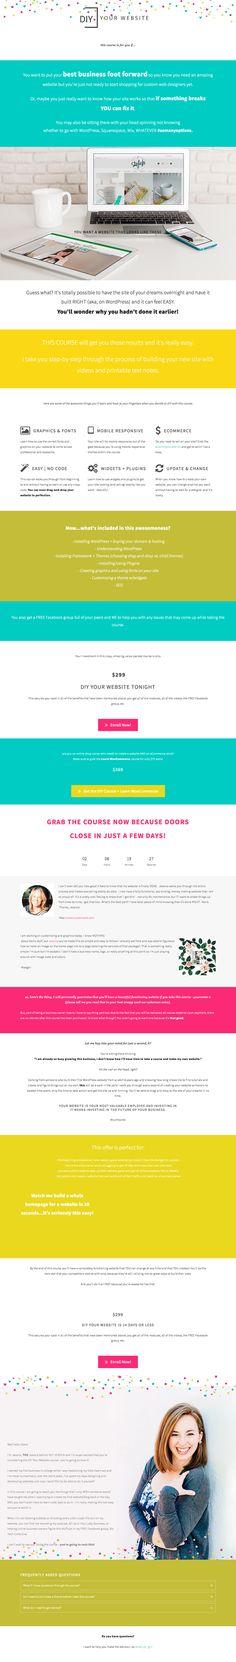 Marie forleos b school sales page tbo interactive pinterest website designs web design landing design web design websites site design fandeluxe Image collections